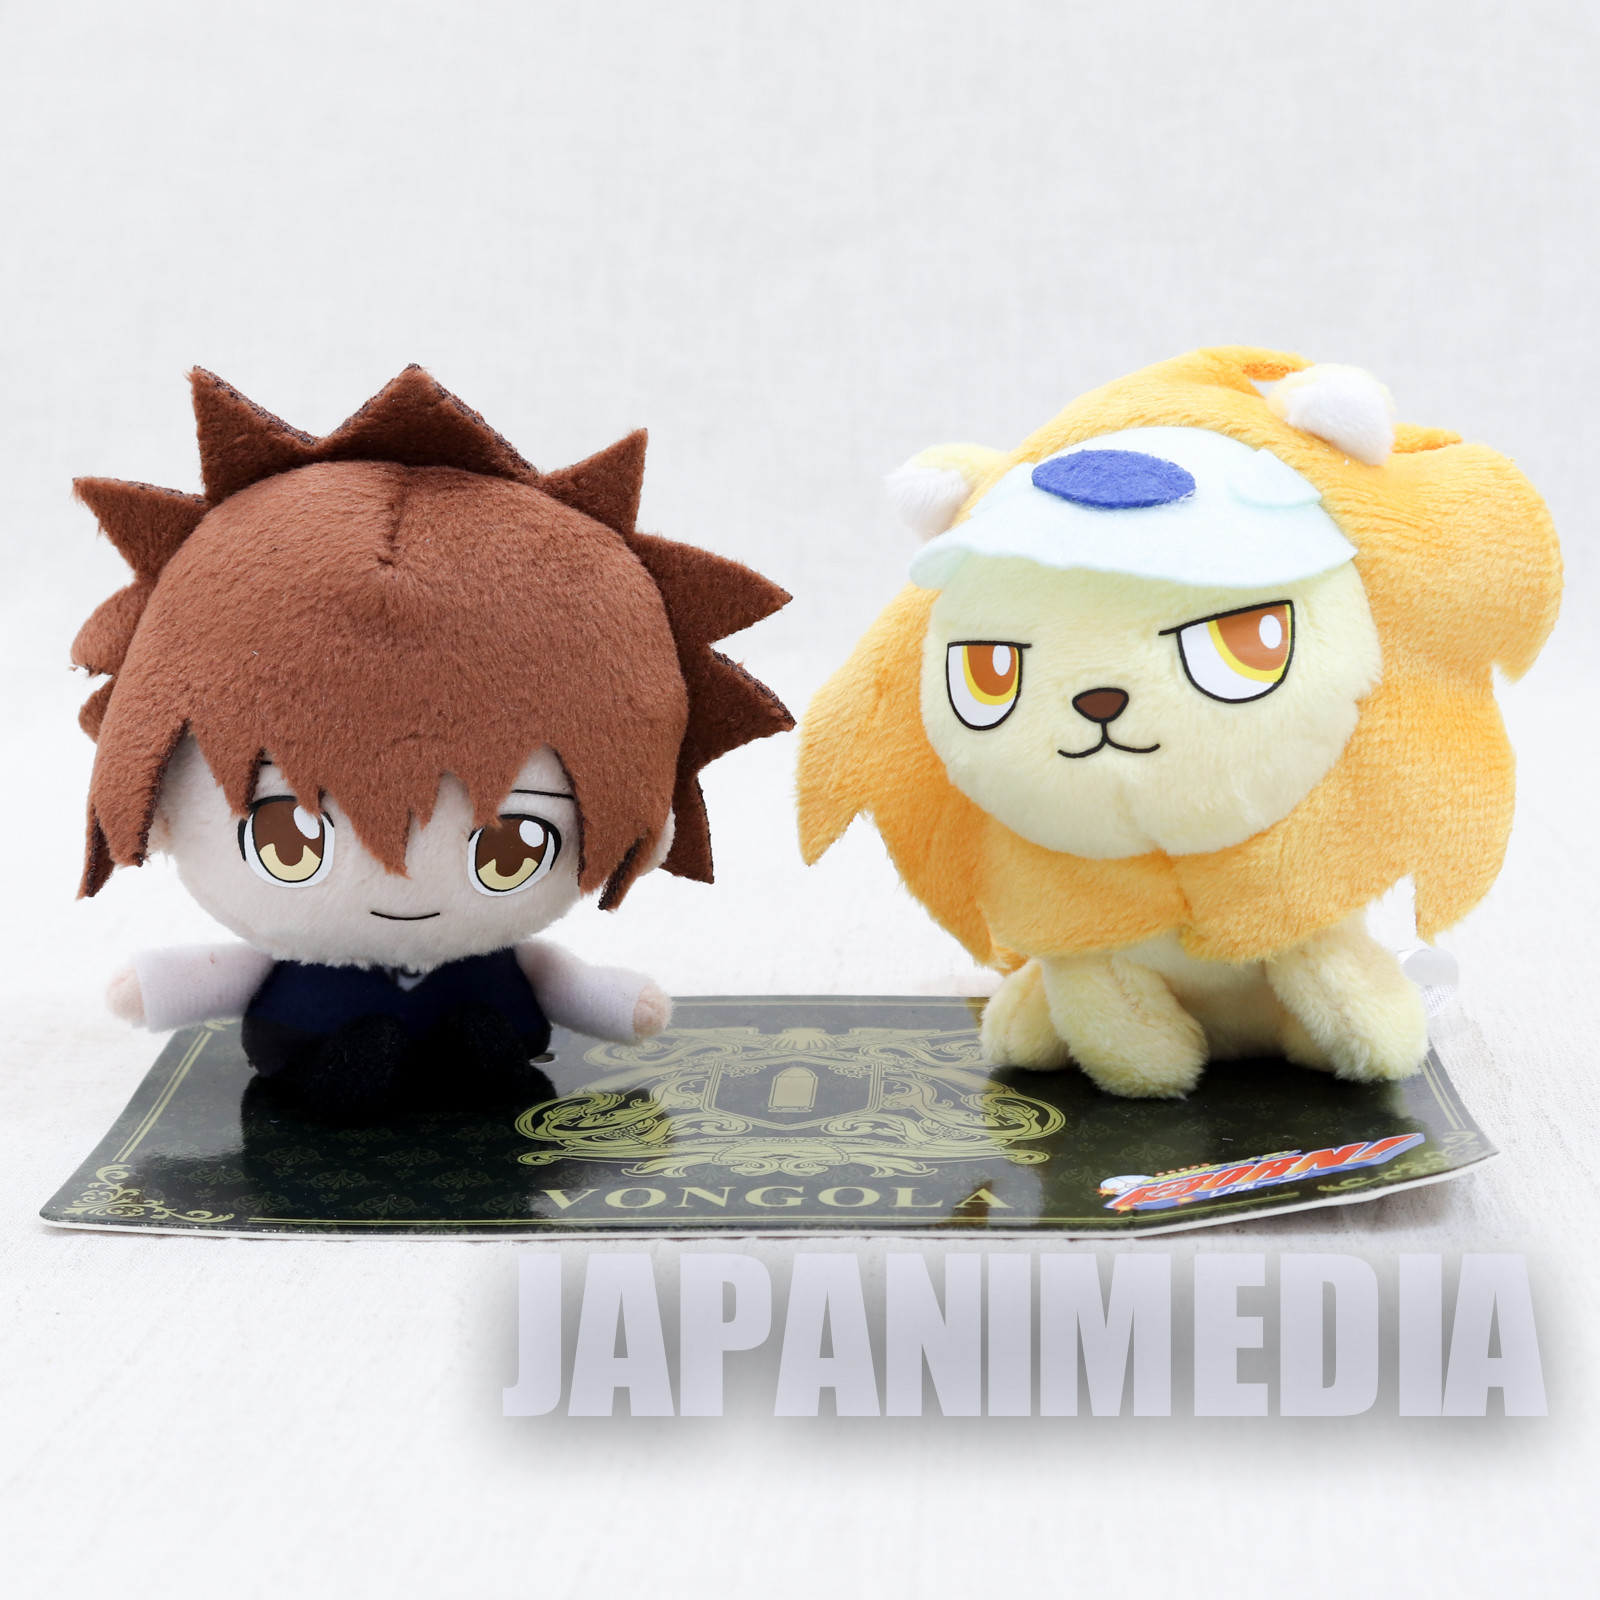 Katekyo Hitman Reborn Tsunayoshi Sawada & Nuts WJ 50th Anniversary Plush doll set  JAPAN MANGA